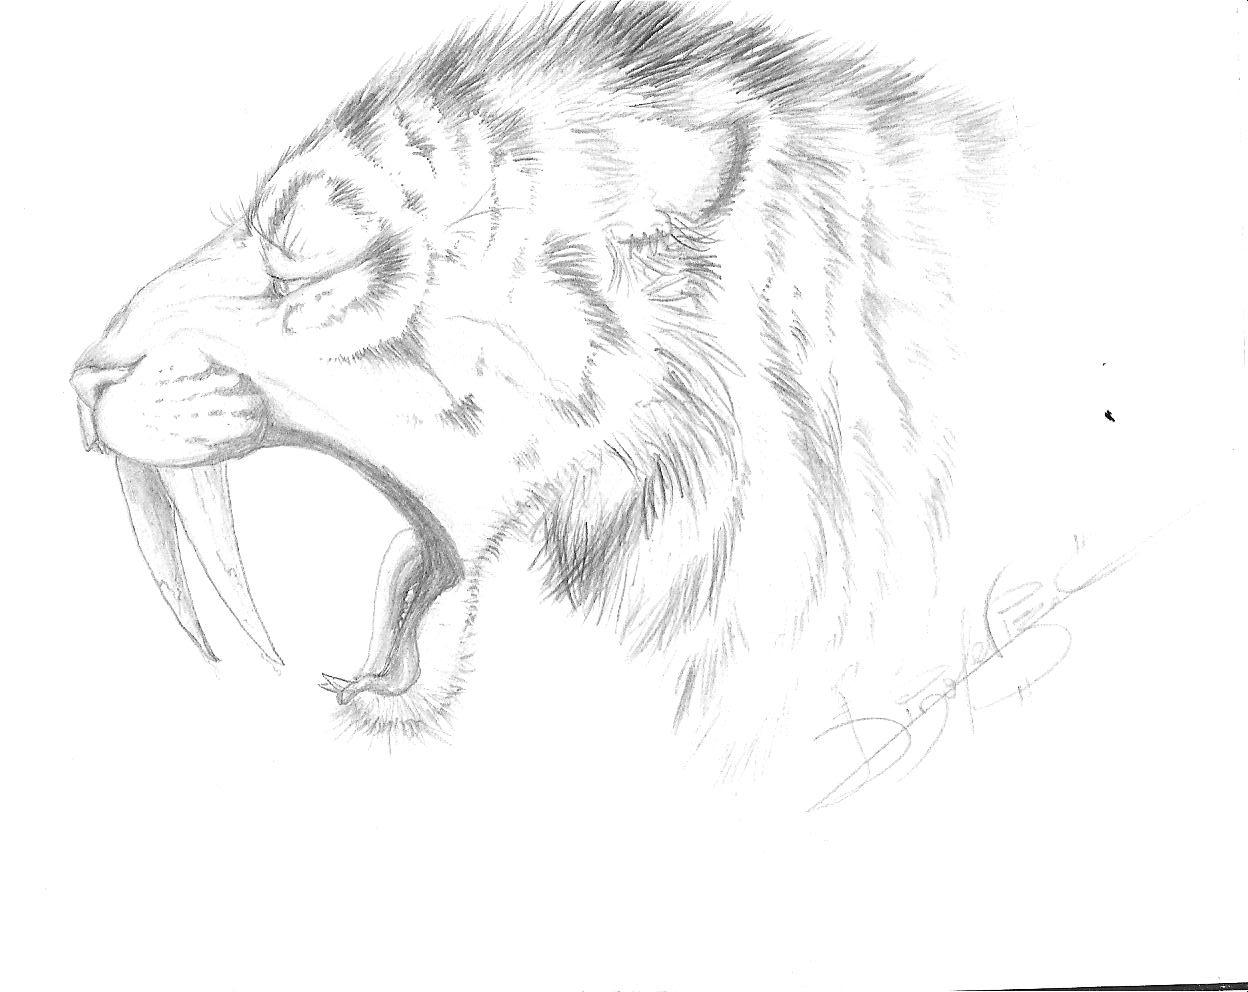 Smilodon Face By Pyroraptor42 On Deviantart: Smilodon Sketch For Jagroar By Jei-Dinofelini On DeviantArt